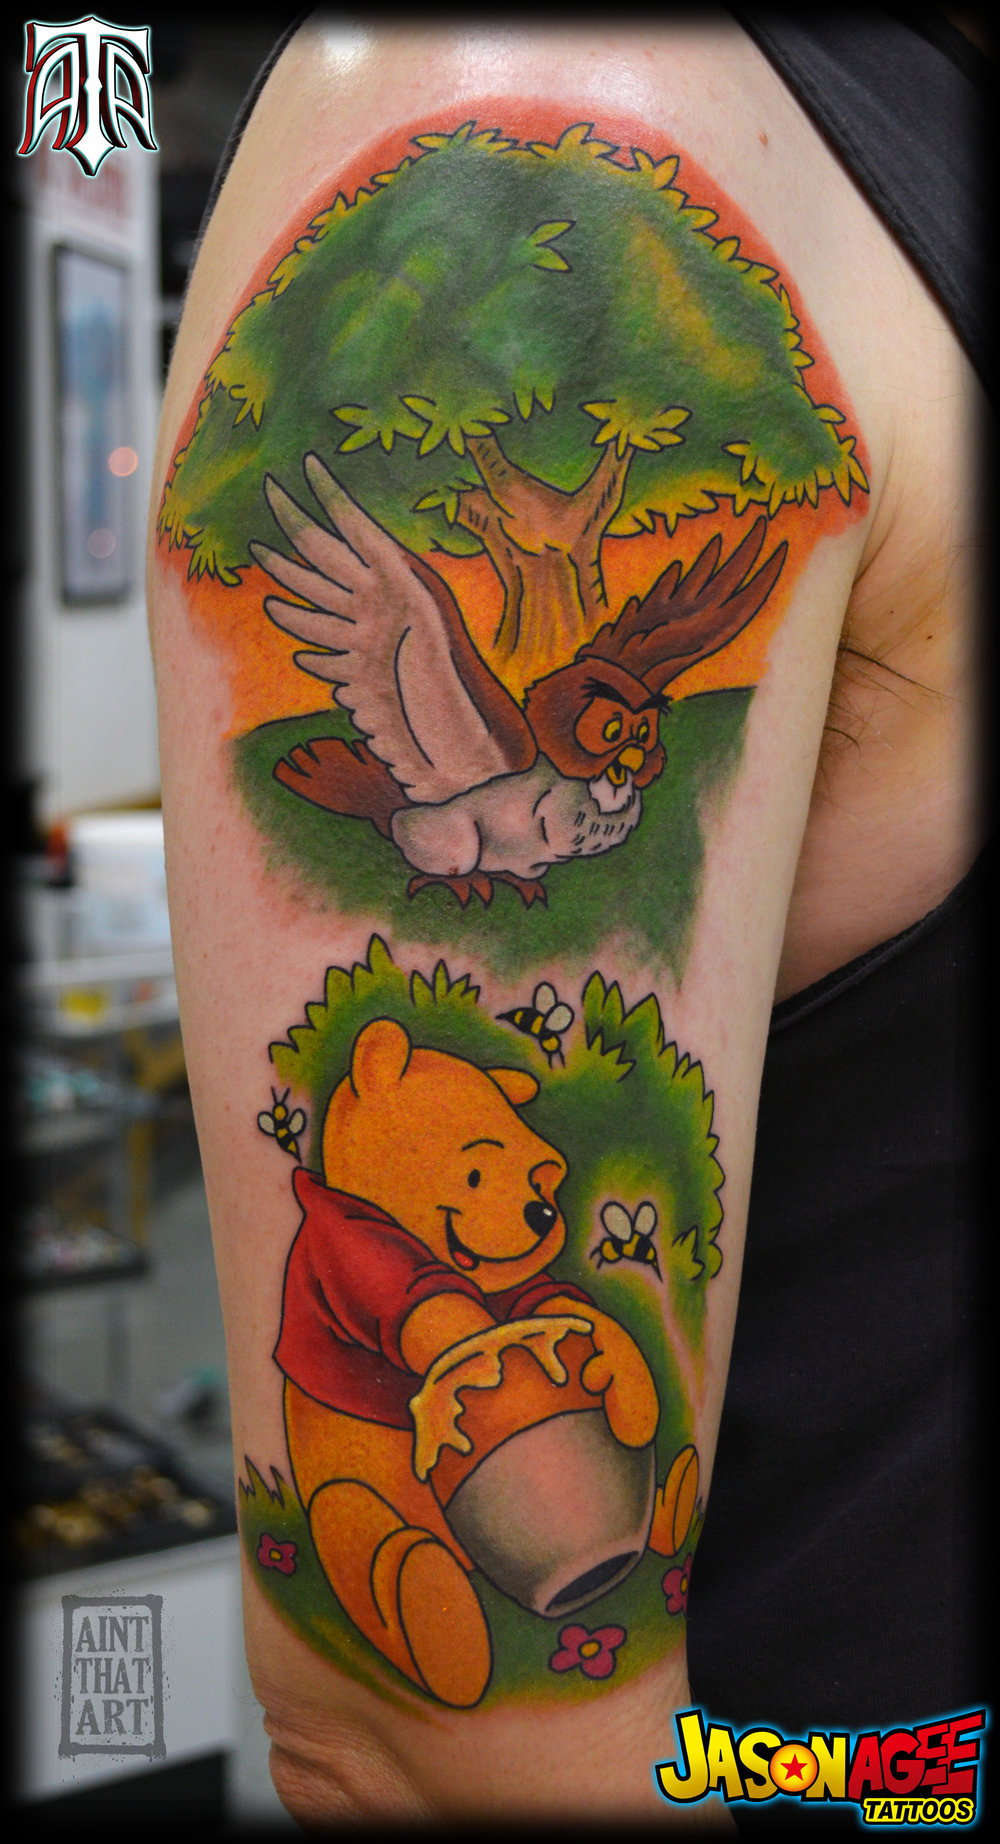 pooh-1.jpg